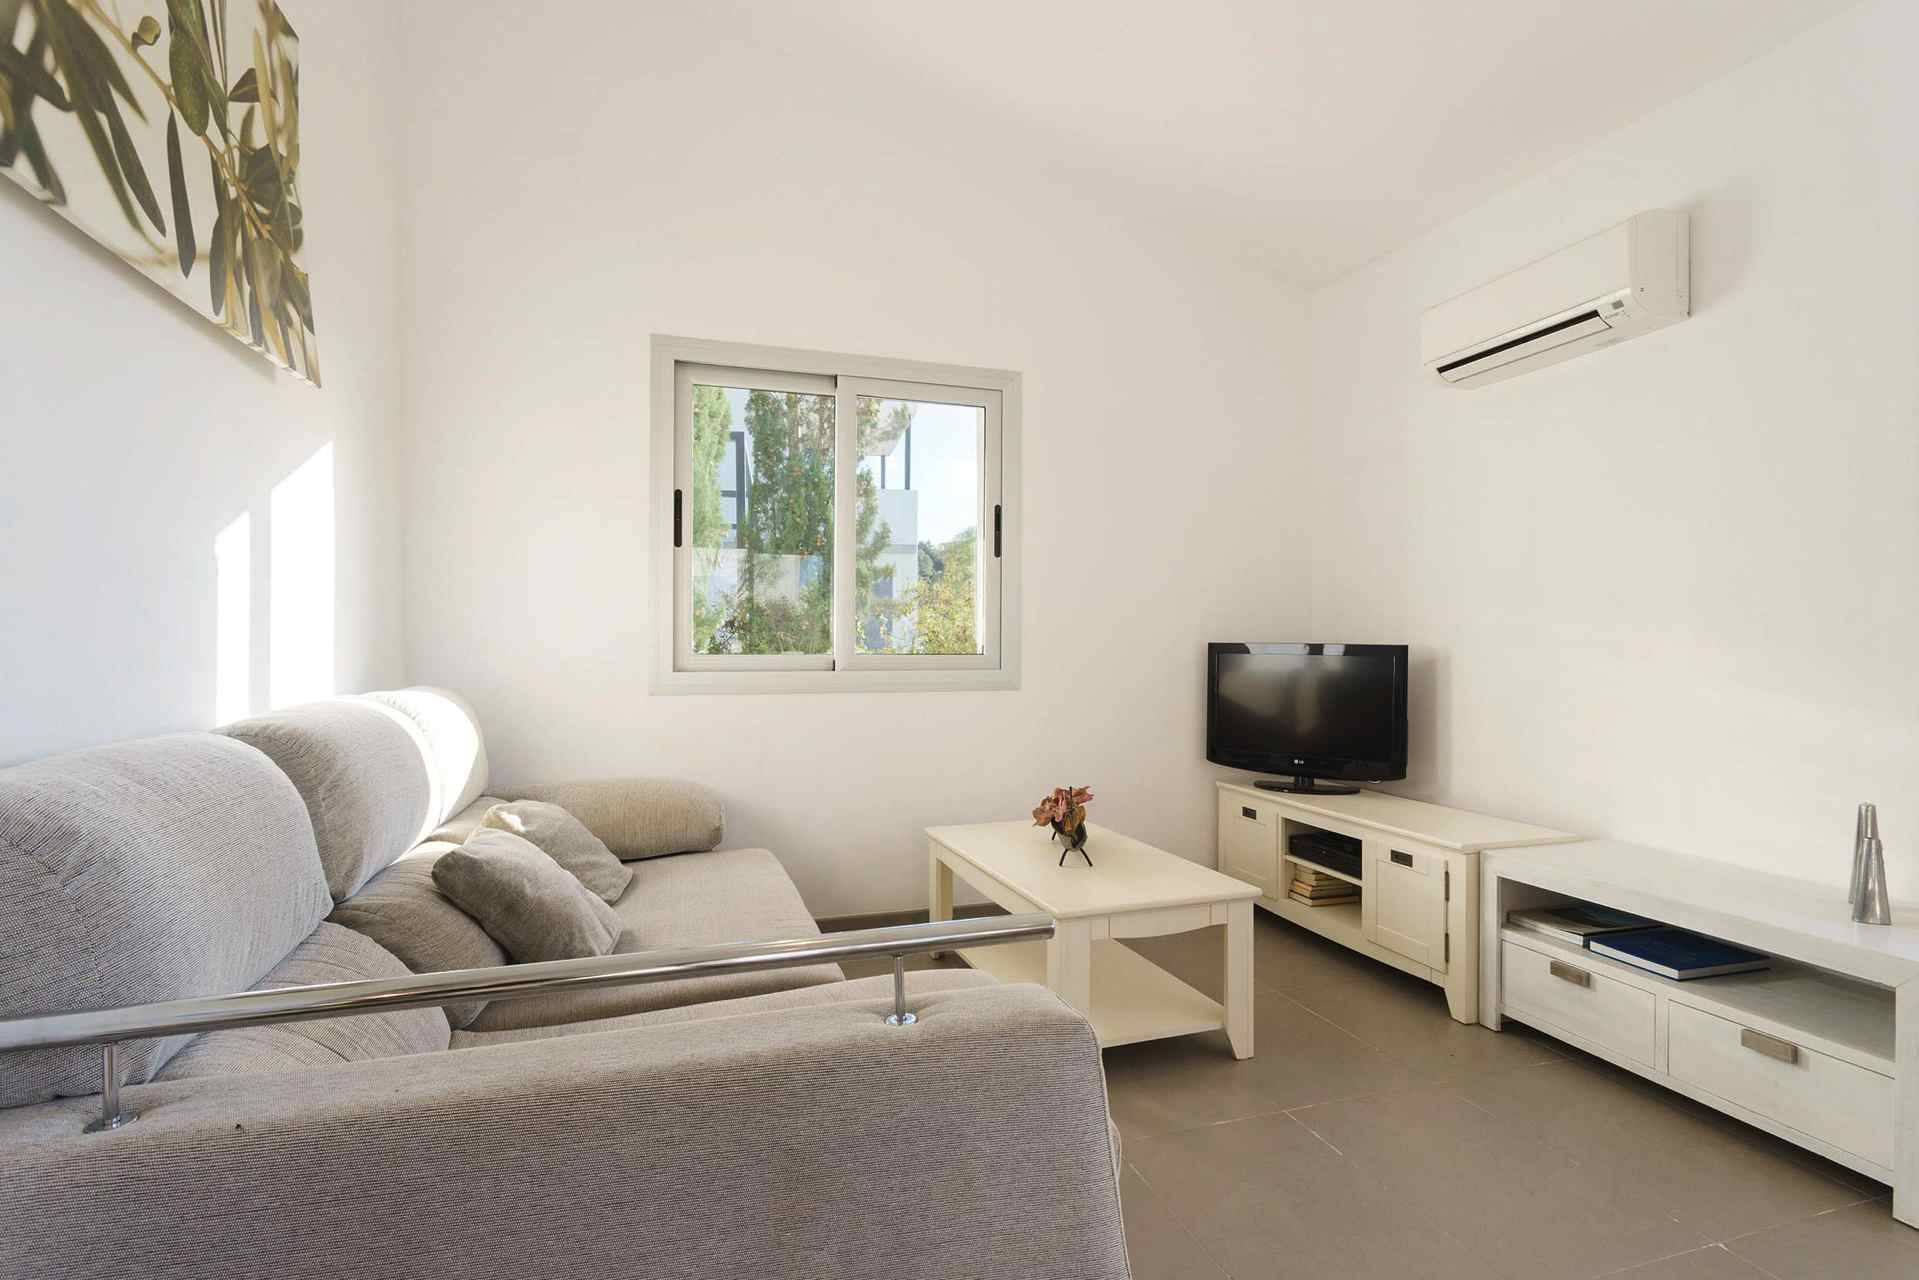 01-282 Ferienhaus Mallorca Norden Meerblick Bild 10